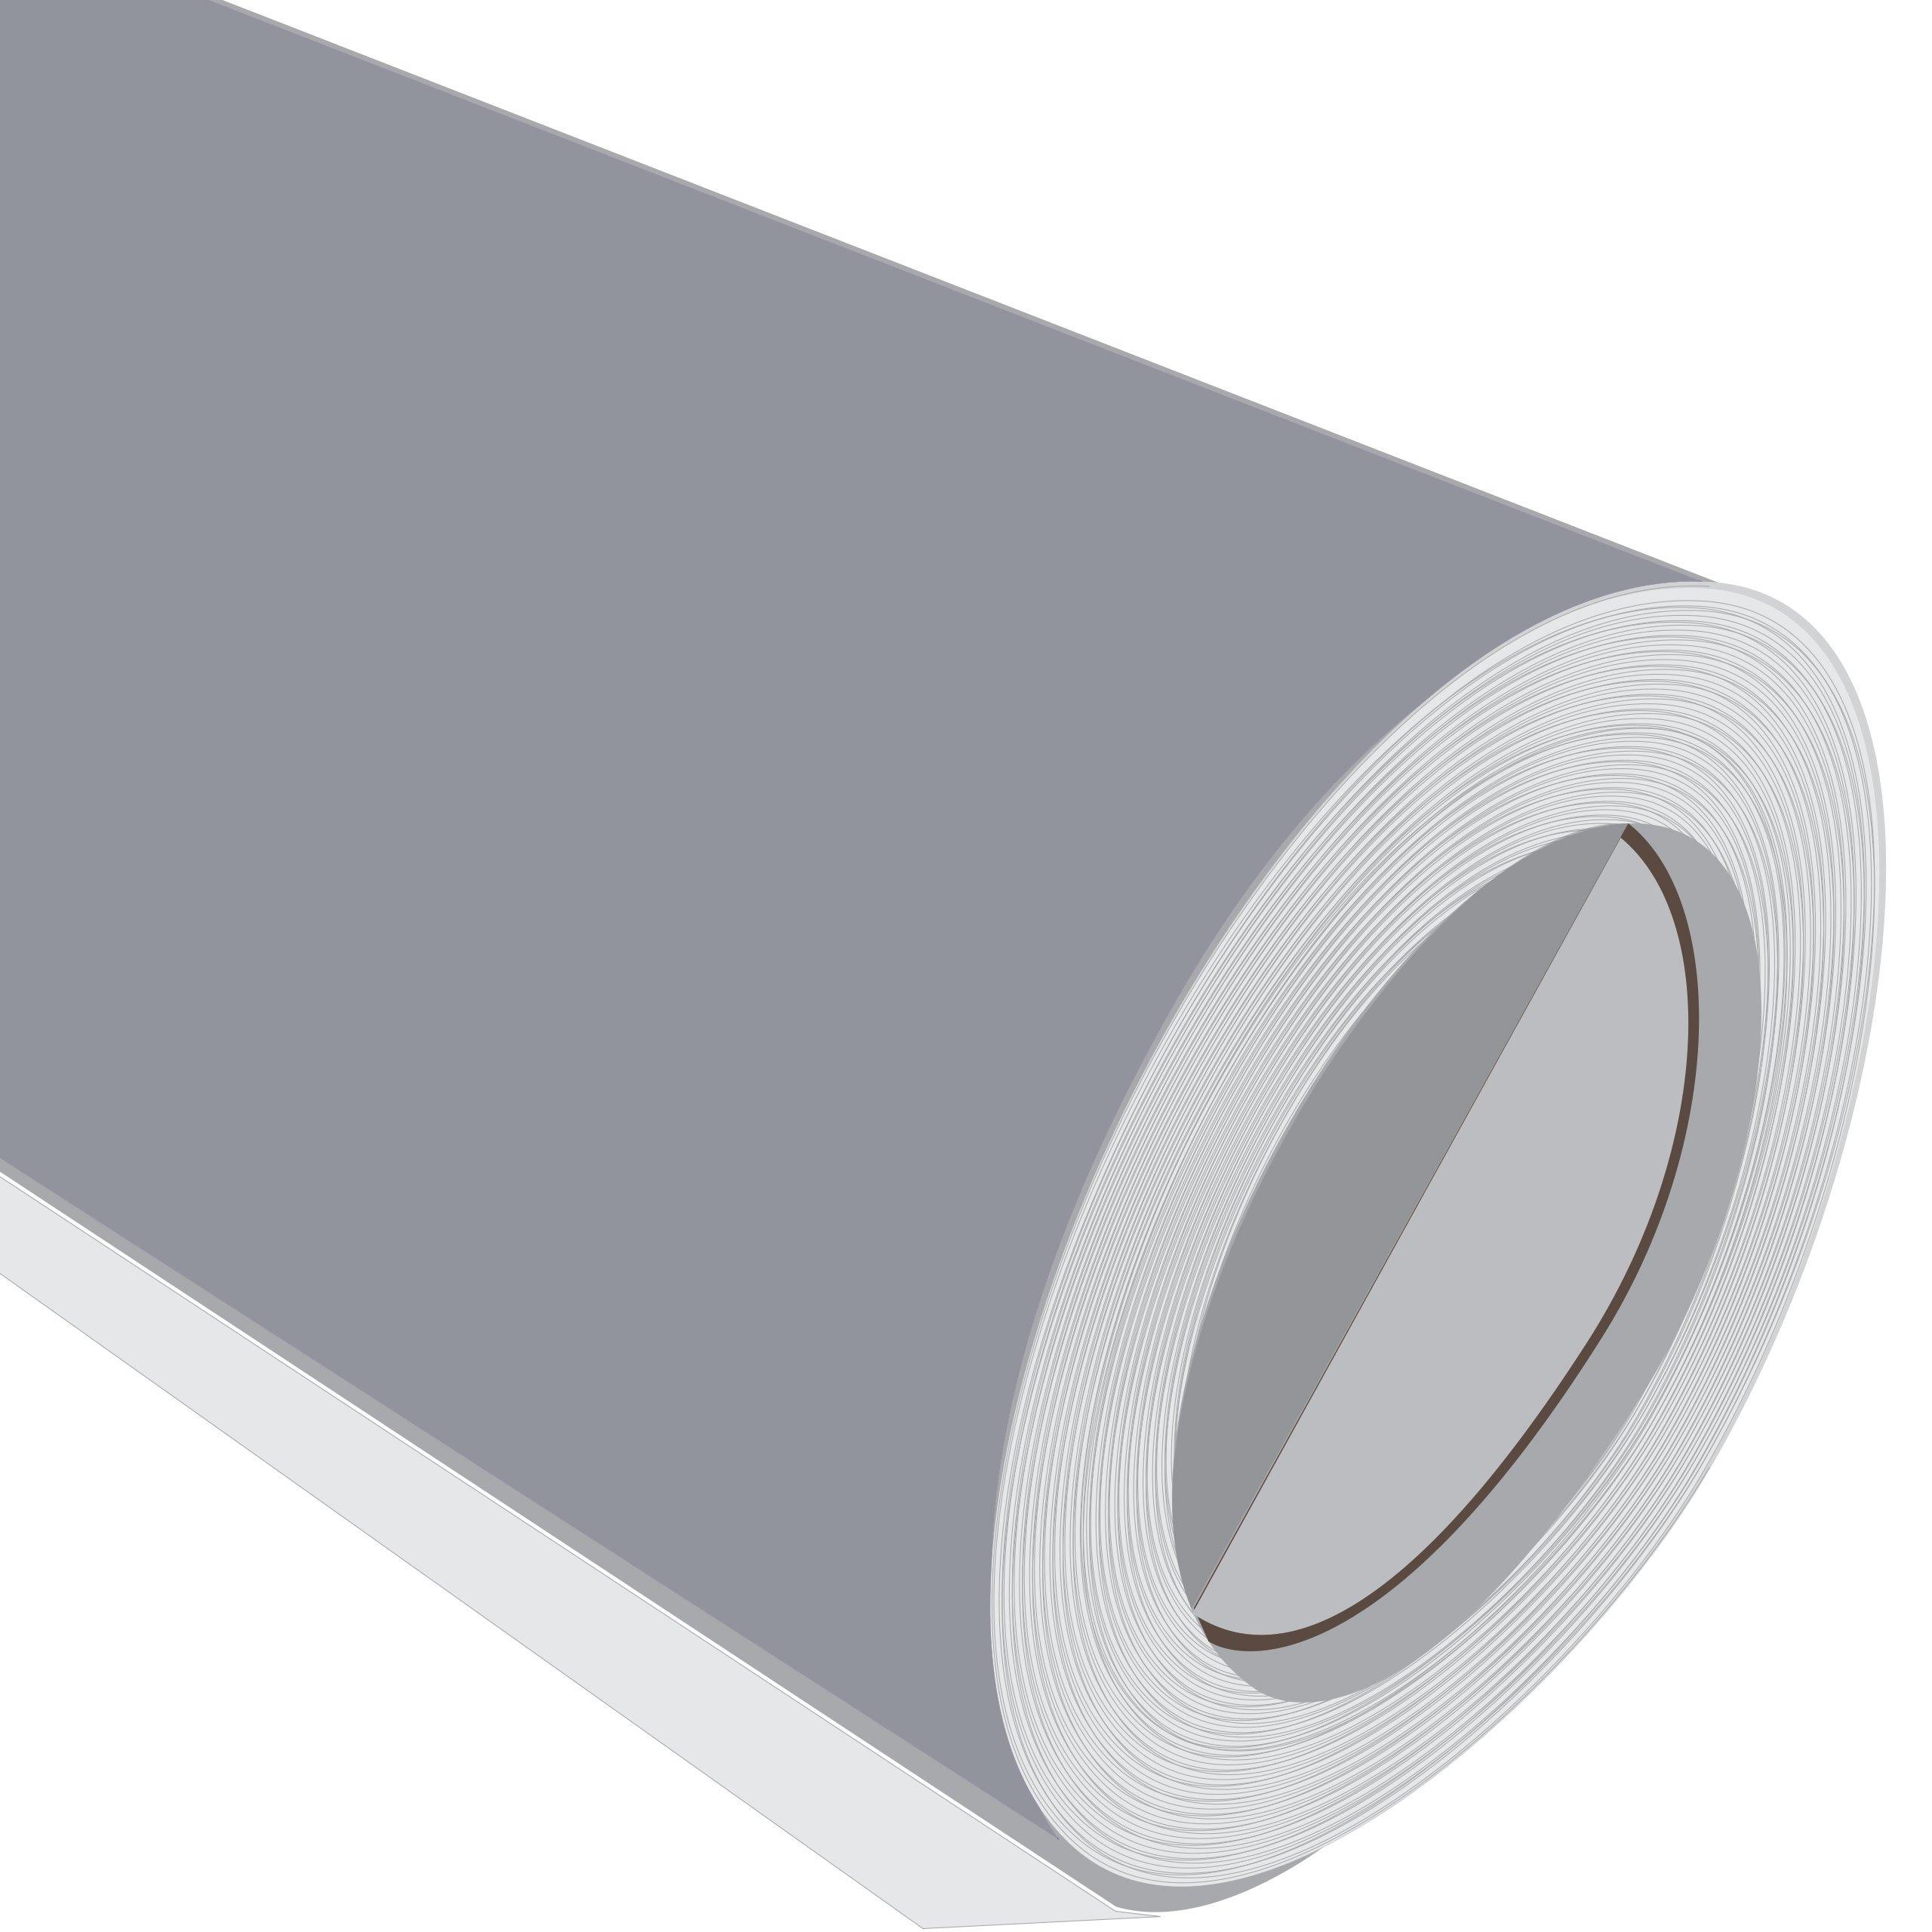 3 Metre (3 m) rollo de HD plata brillante 610 mm de ancho Vinilo autoadhesivo: Amazon.es: Hogar